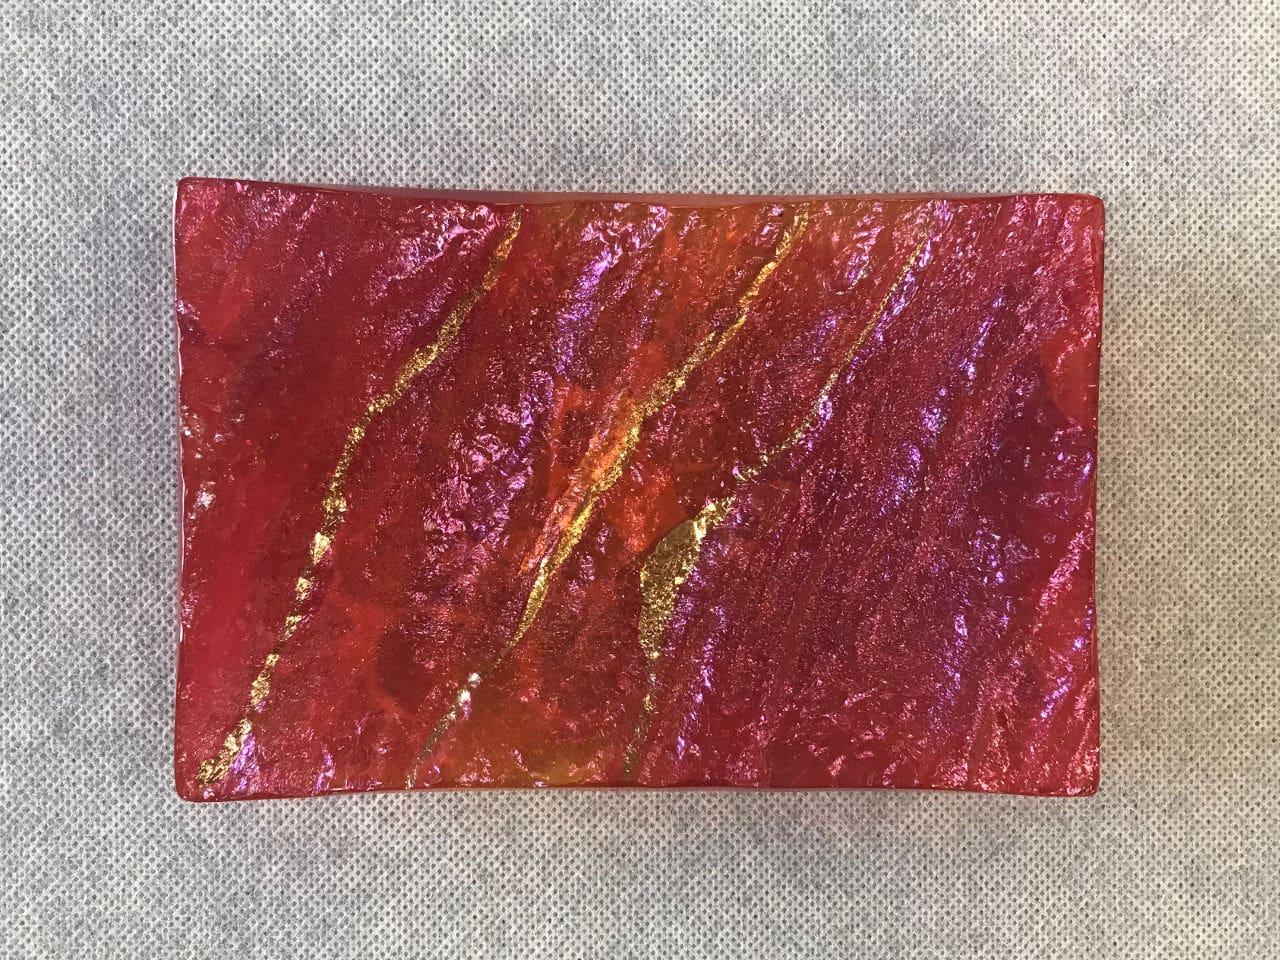 Hawai'i Lava Trinket Tray by Marian Fieldson. Lava flow-molded functional glass art with 22K gold accents handmade on Hawai'i.